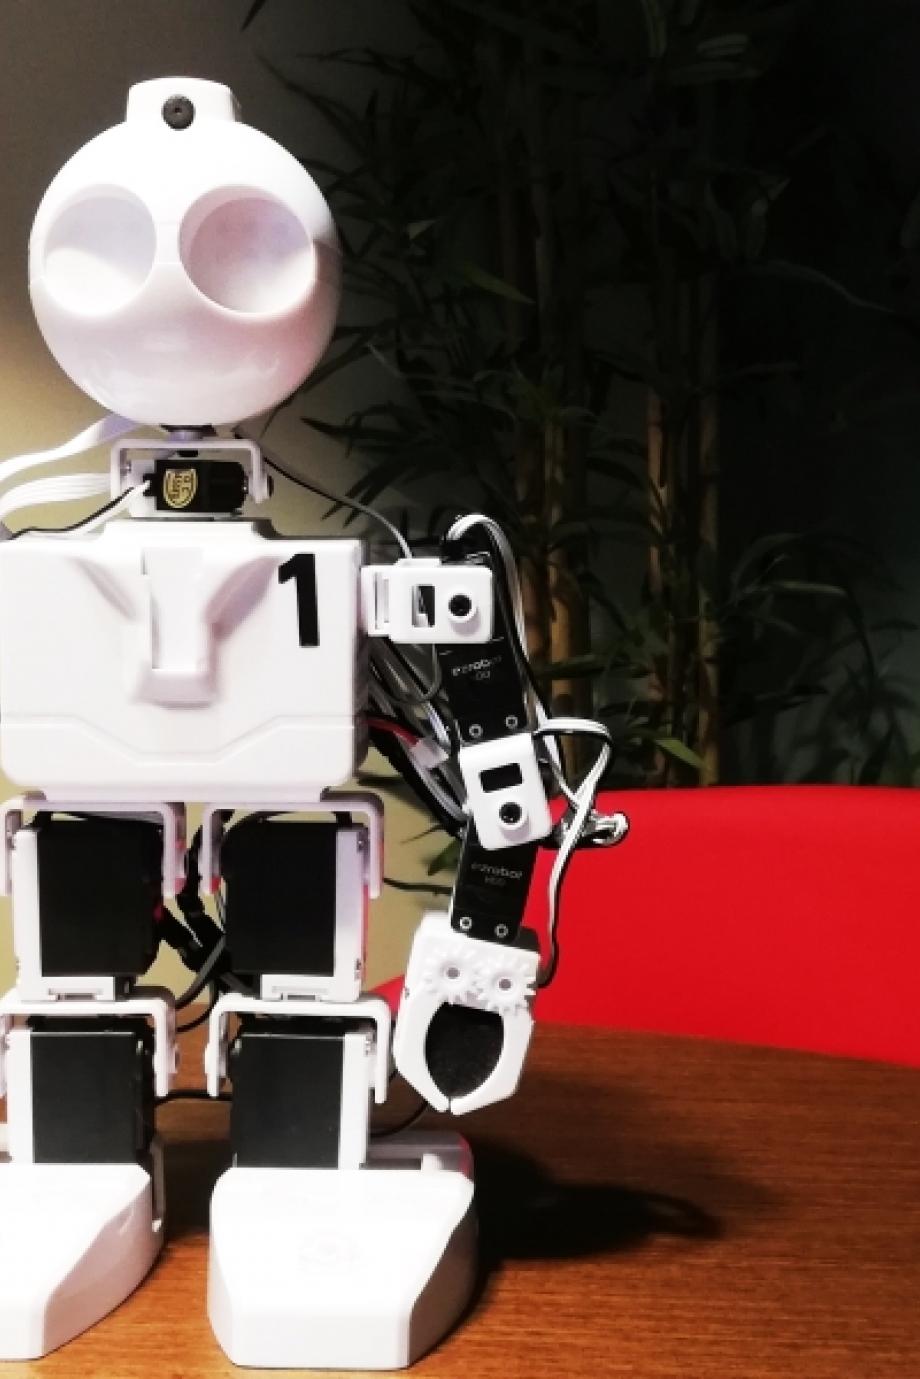 Teckies caça aos robôs